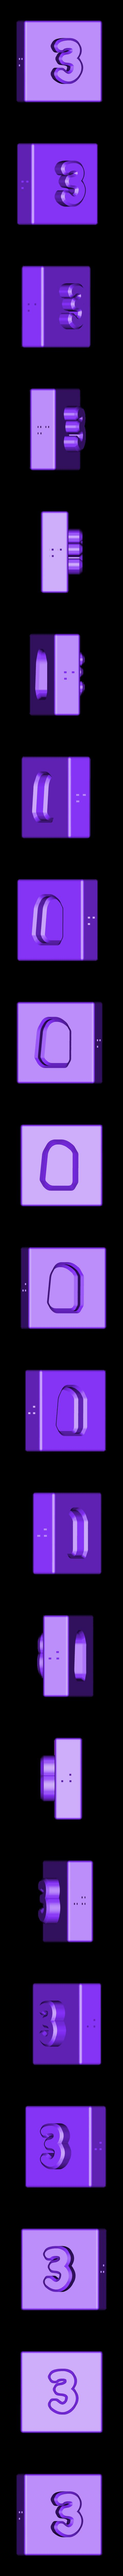 3.stl Download free STL file Mental blocks • Object to 3D print, RevK